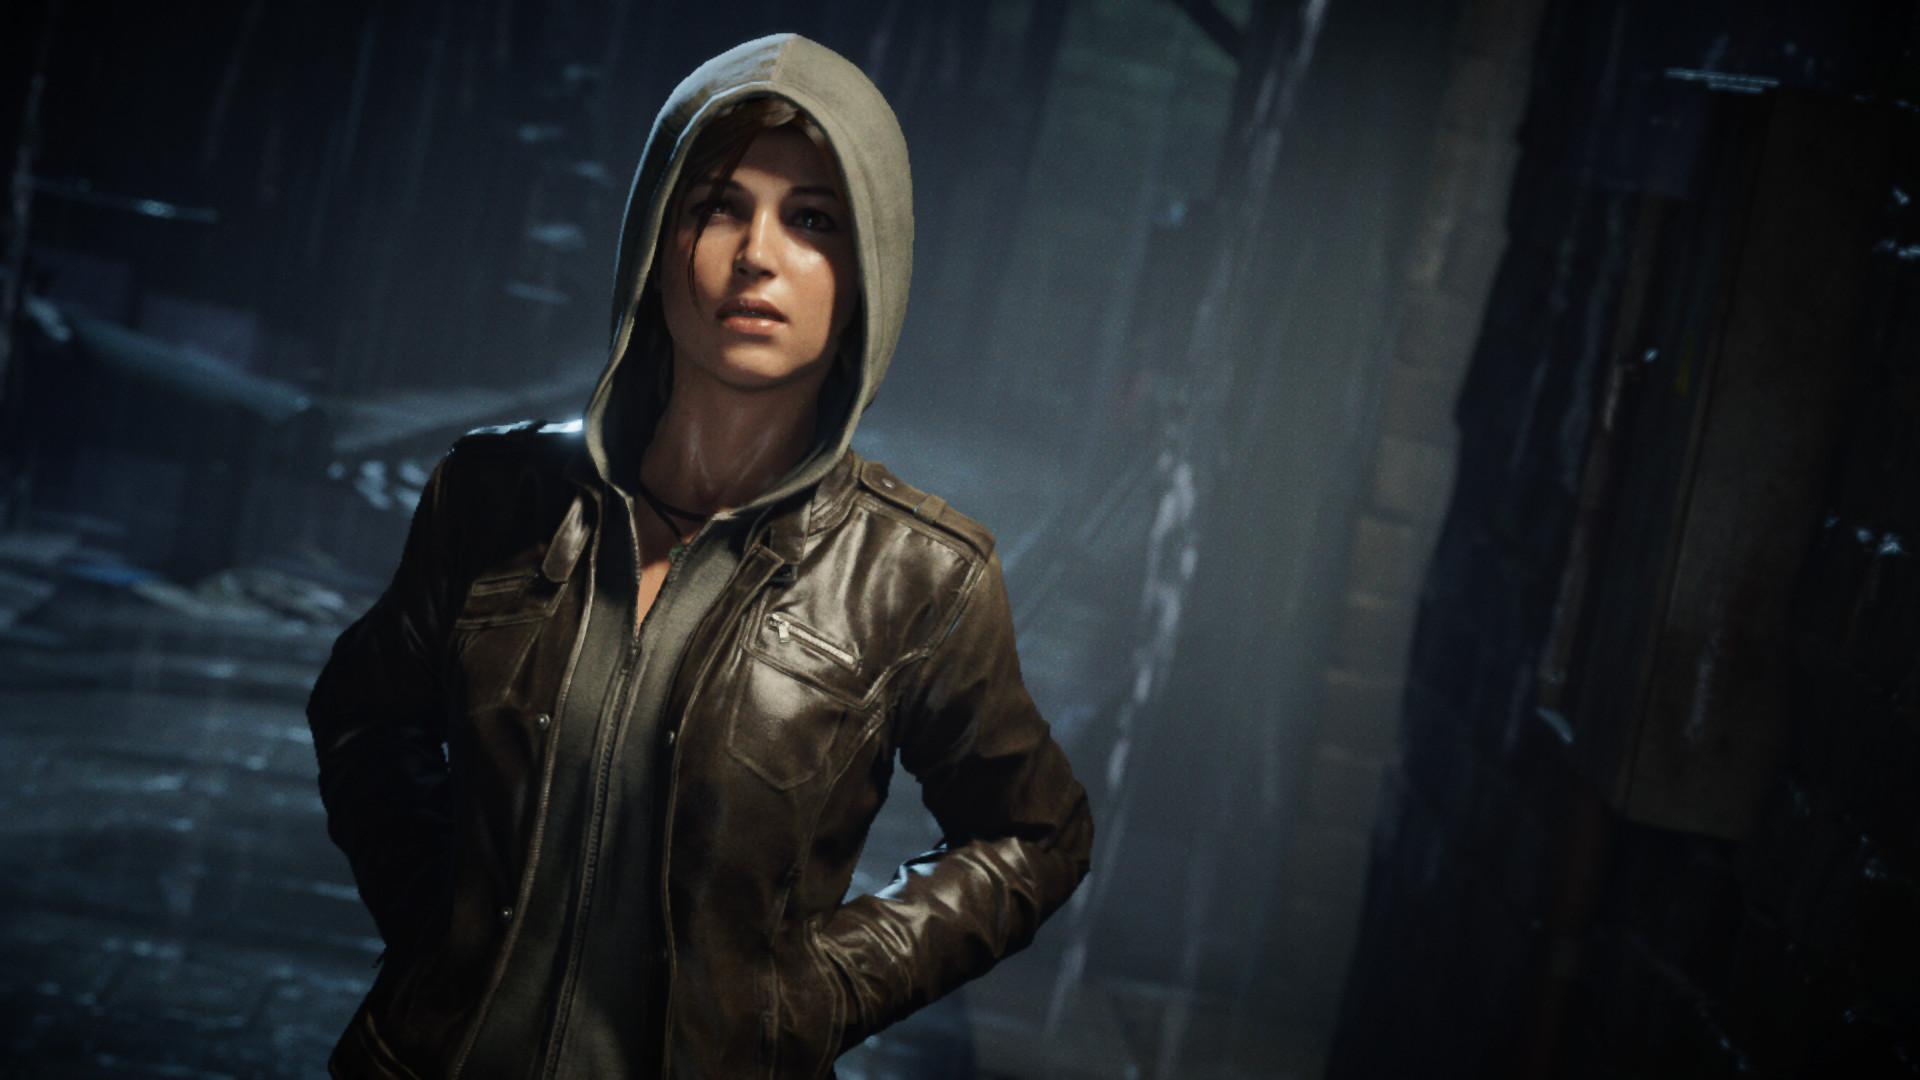 da3dd010f2a96 Rise of the Tomb Raider review